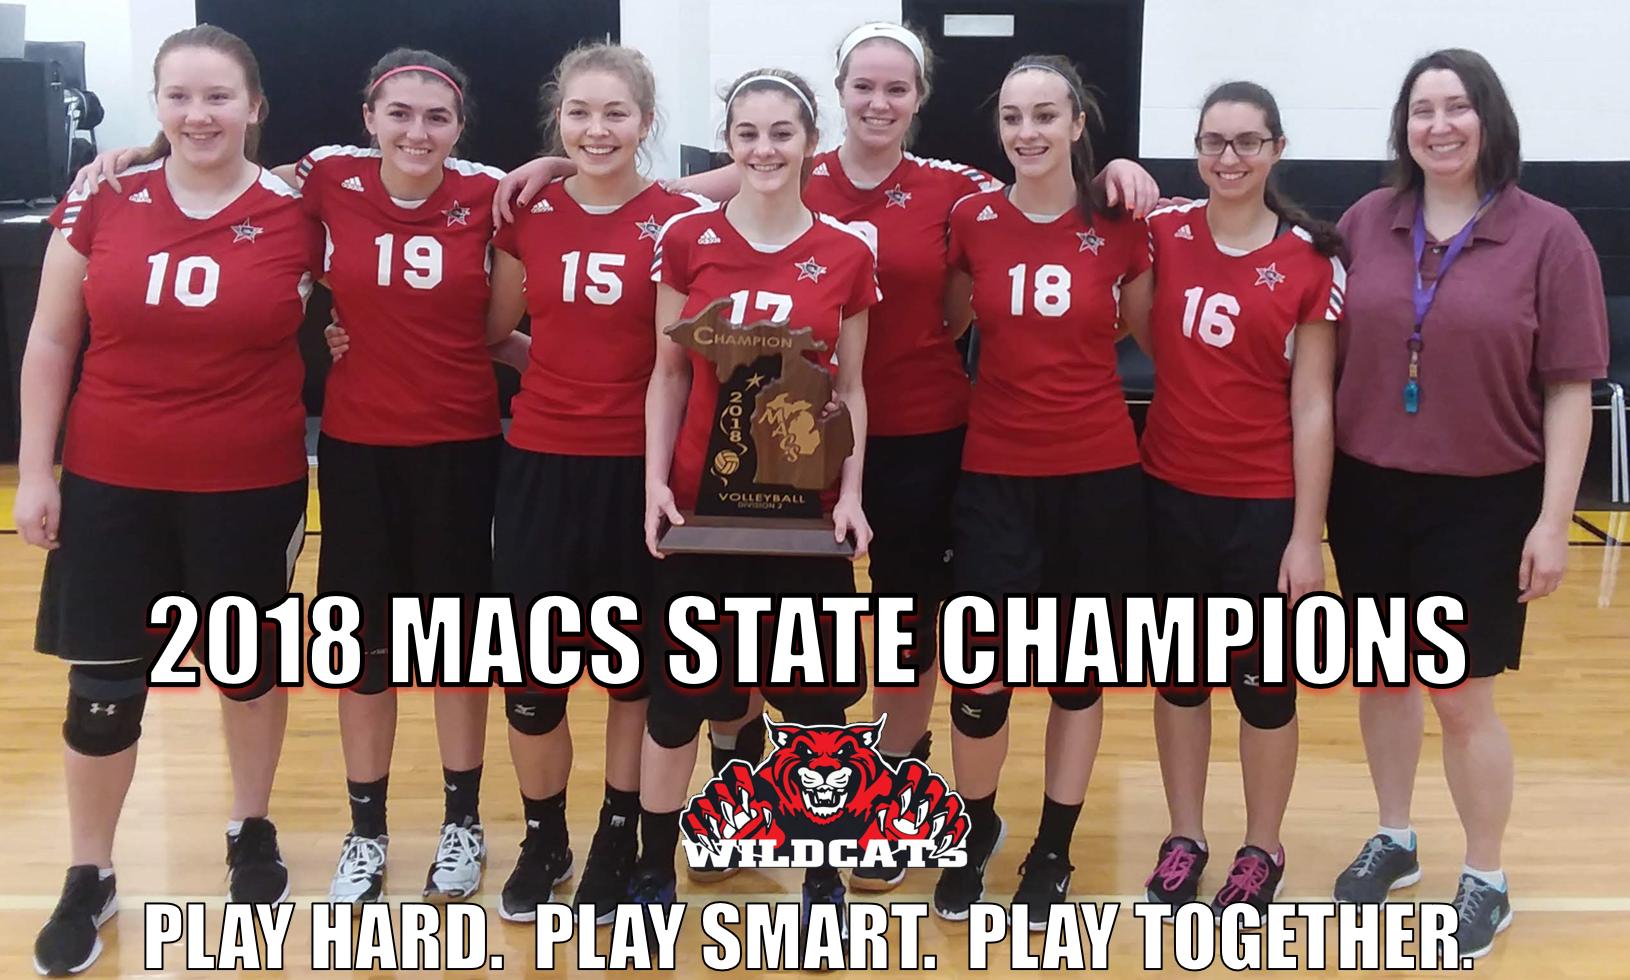 2018 MACS State Champions